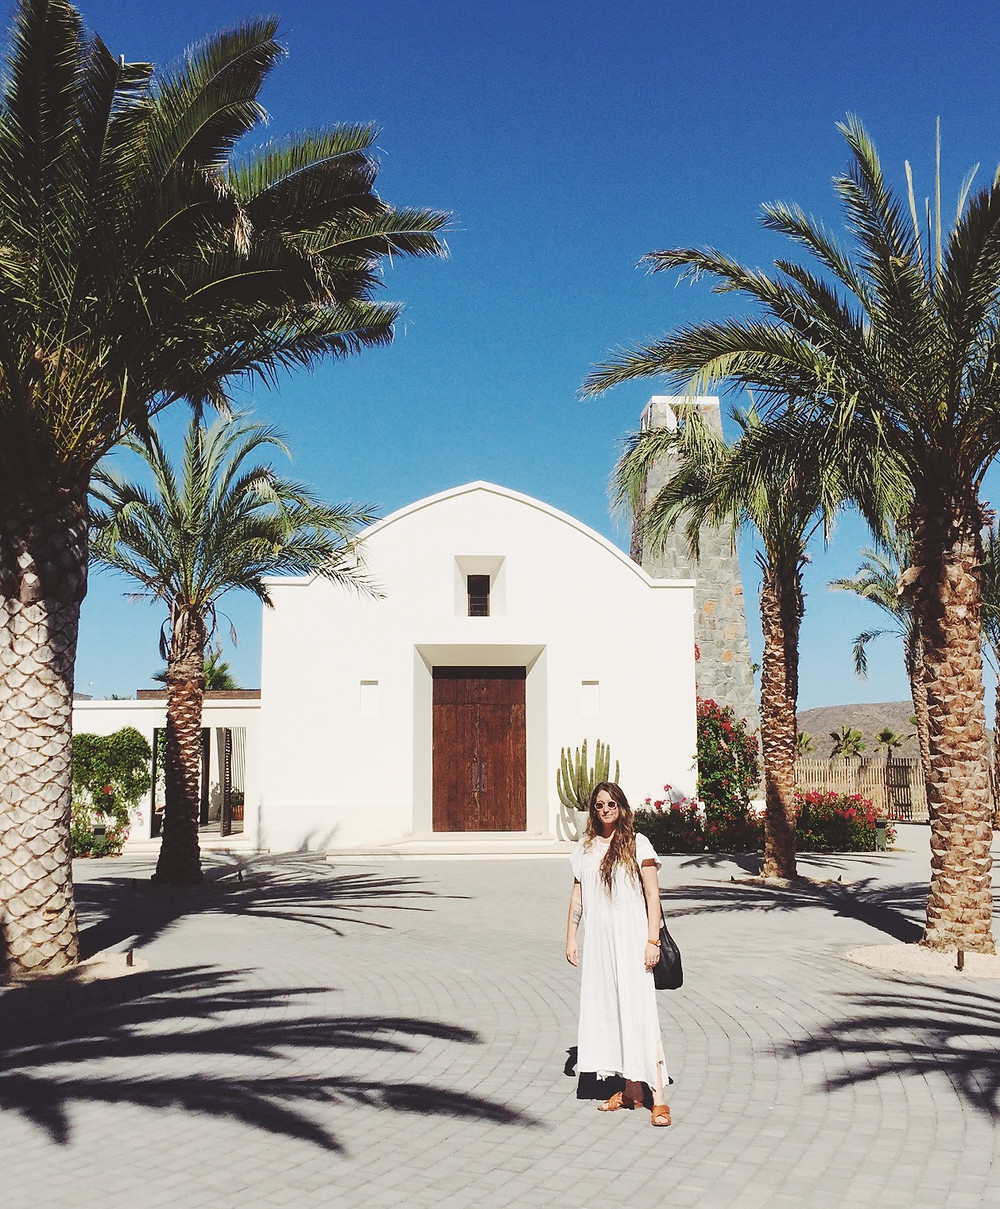 Best Places to Stay in Todos Santos - Emily Katz Travels Todo Santos Mexico - San Cristobal Hotel Church